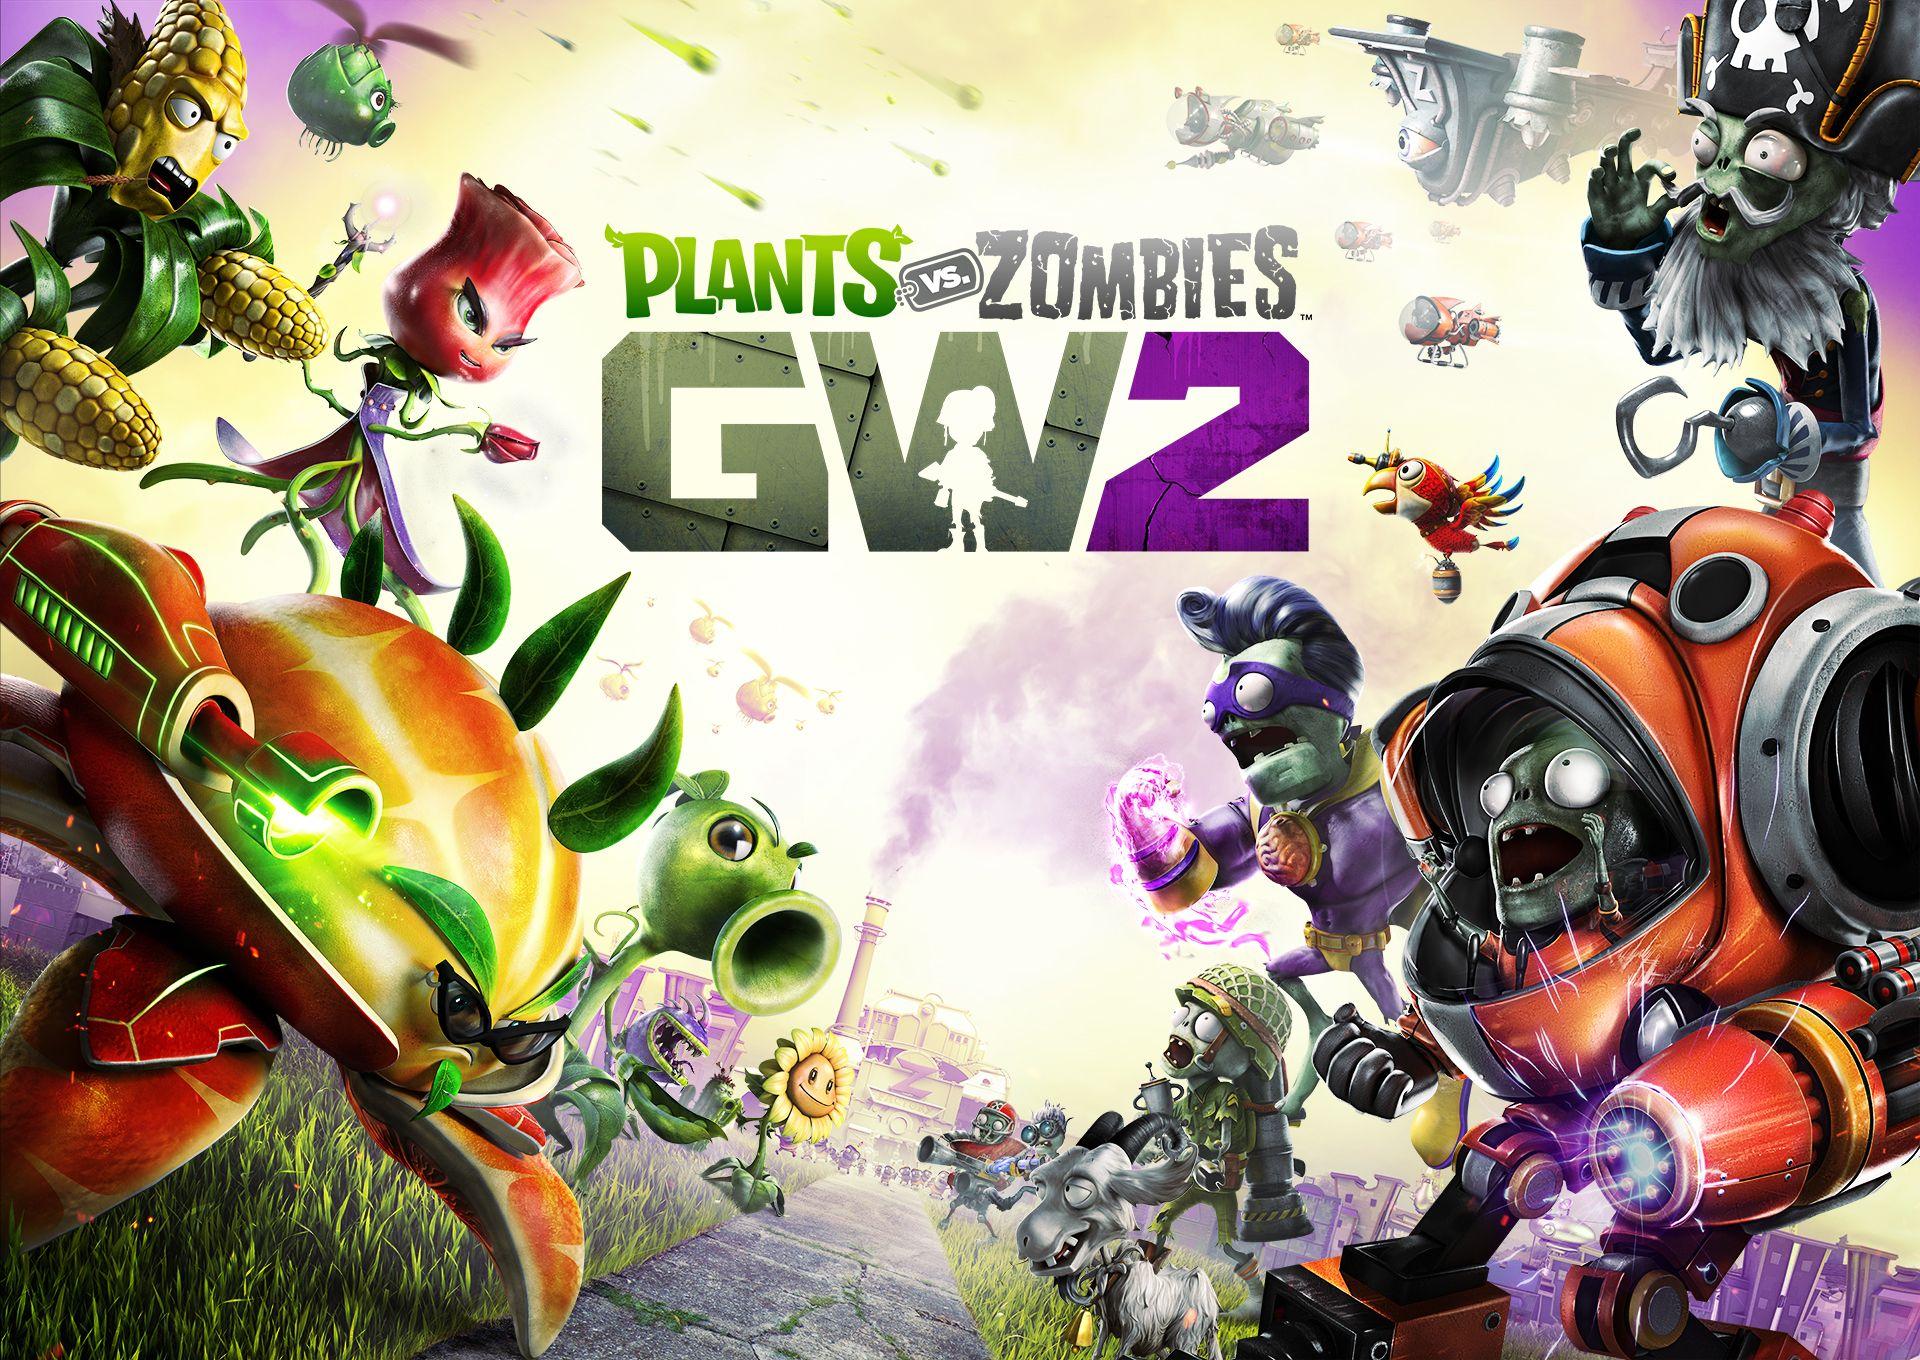 Image for plants vs zombies garden warfare 2 wallpaper hd - Plants vs zombies garden warfare 2 torchwood ...